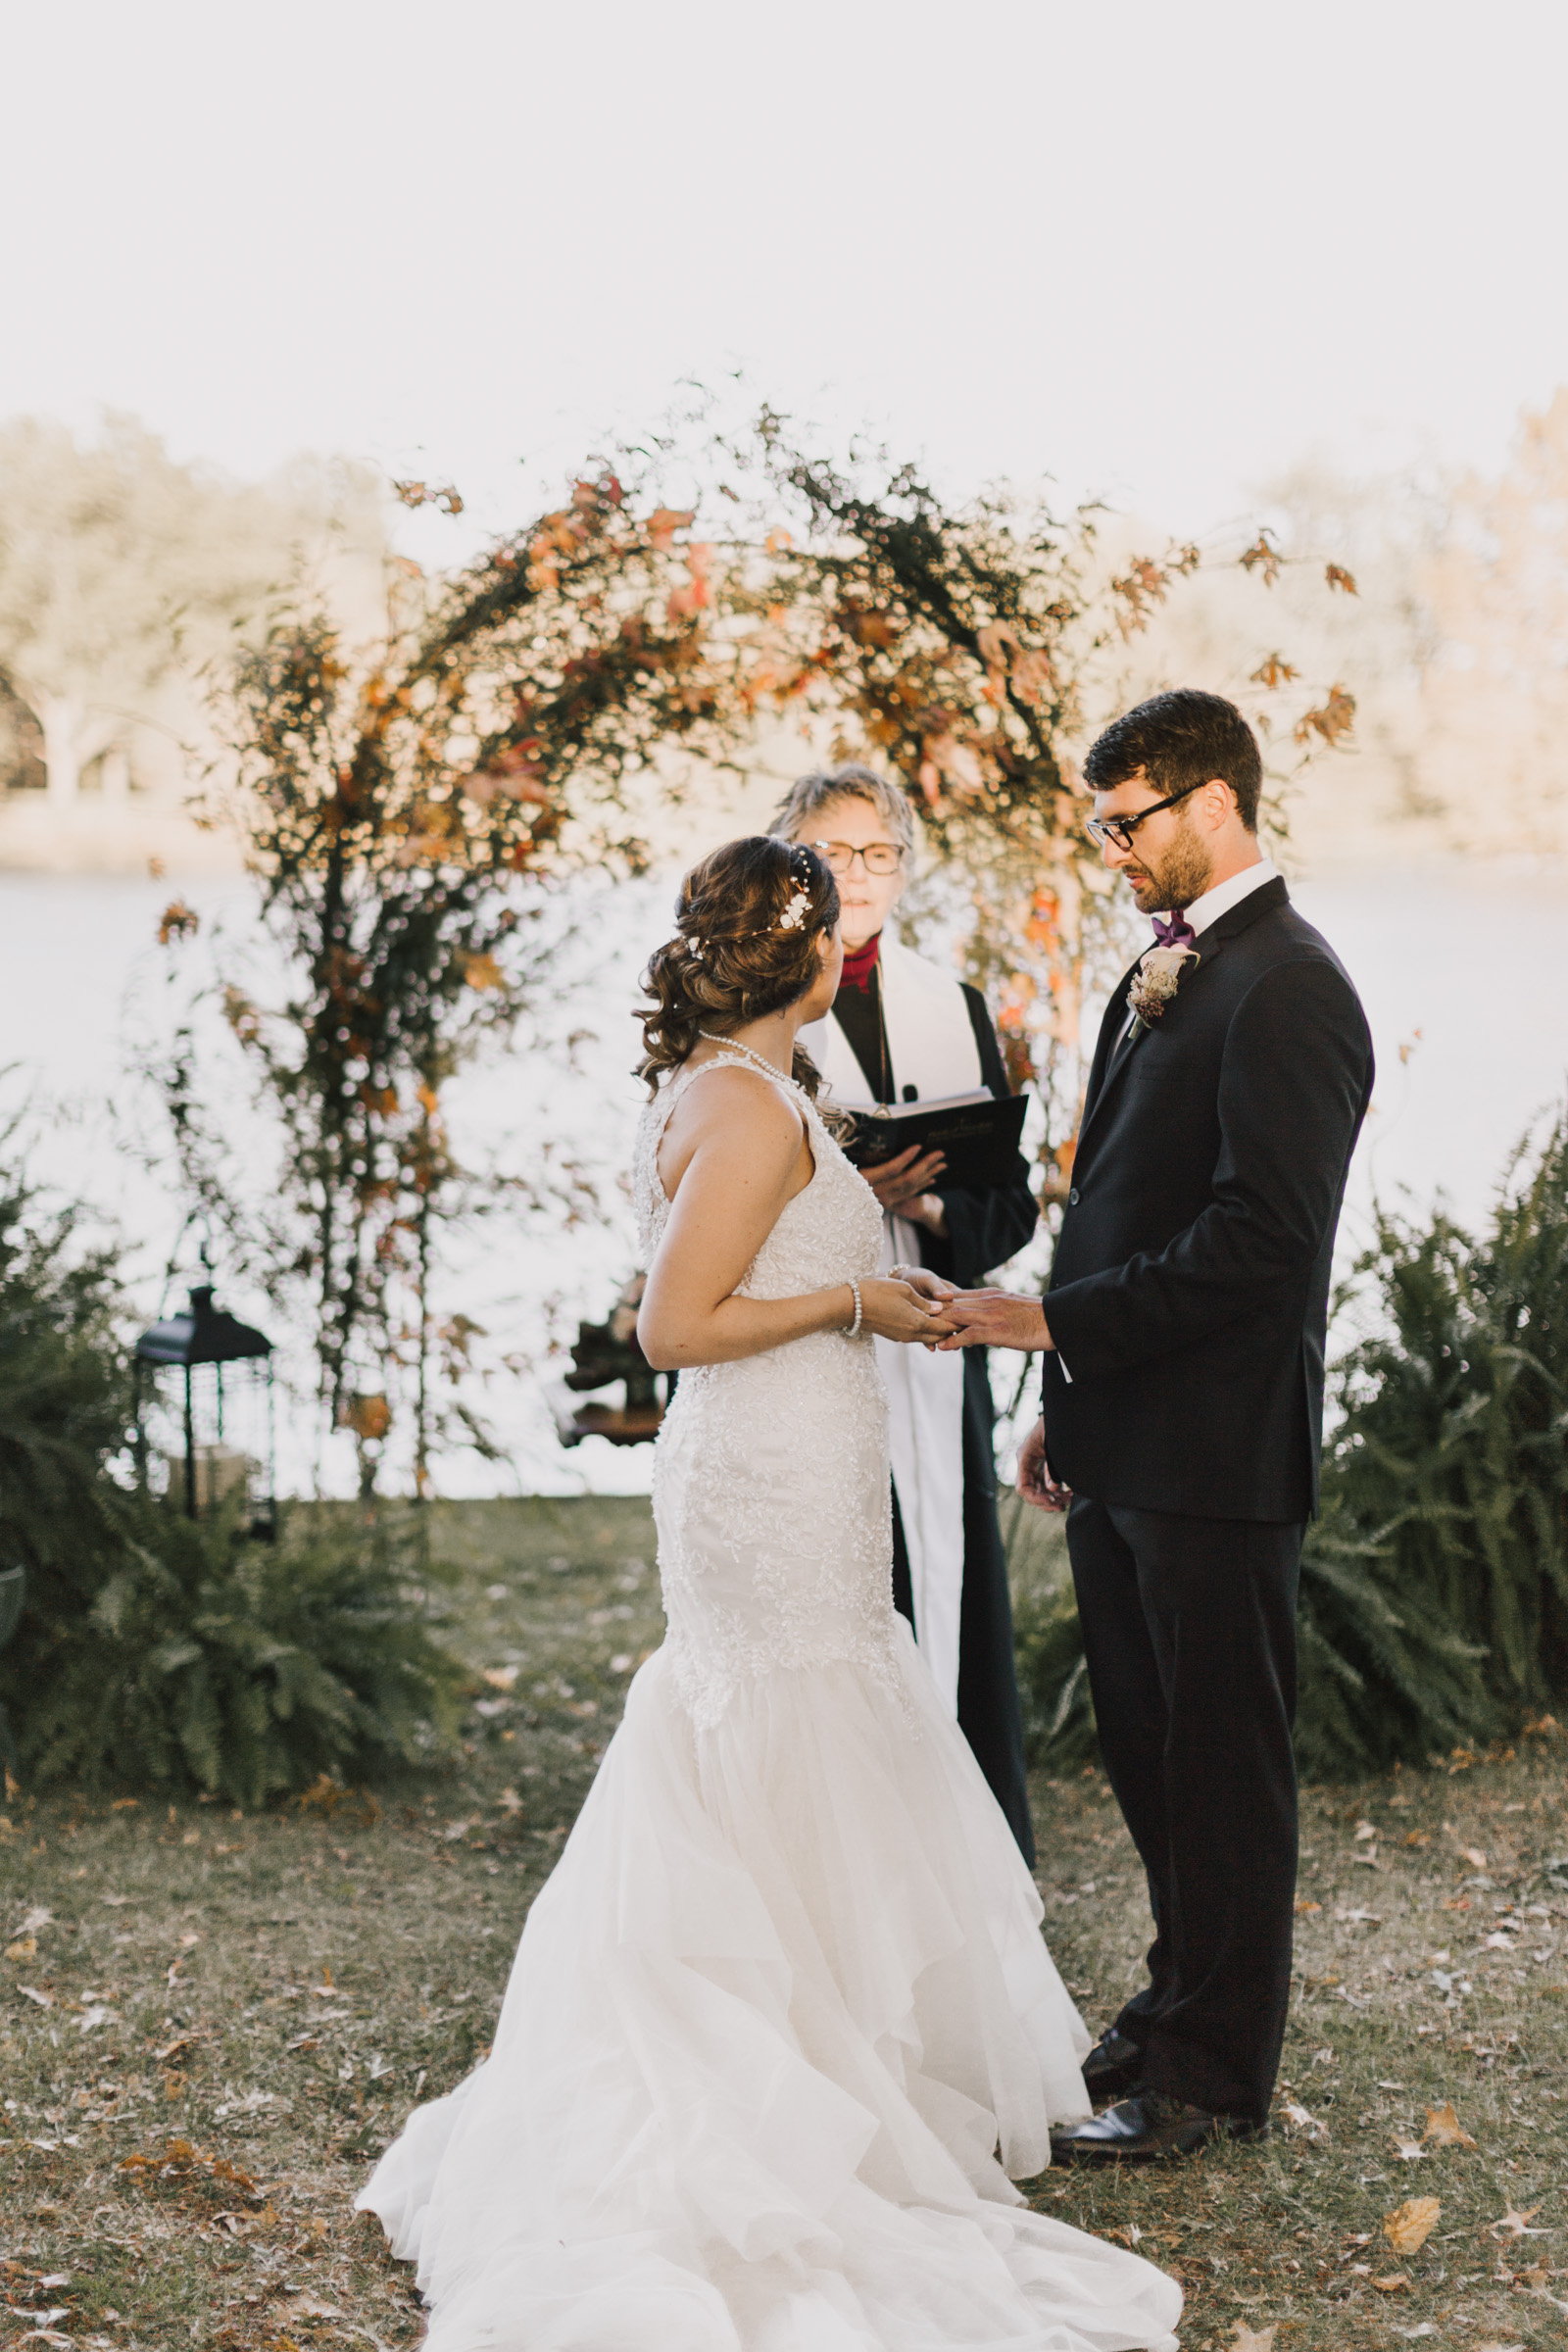 alyssa barletter photography intimate fall autumn wedding rural missouri wedding photographer-32.jpg